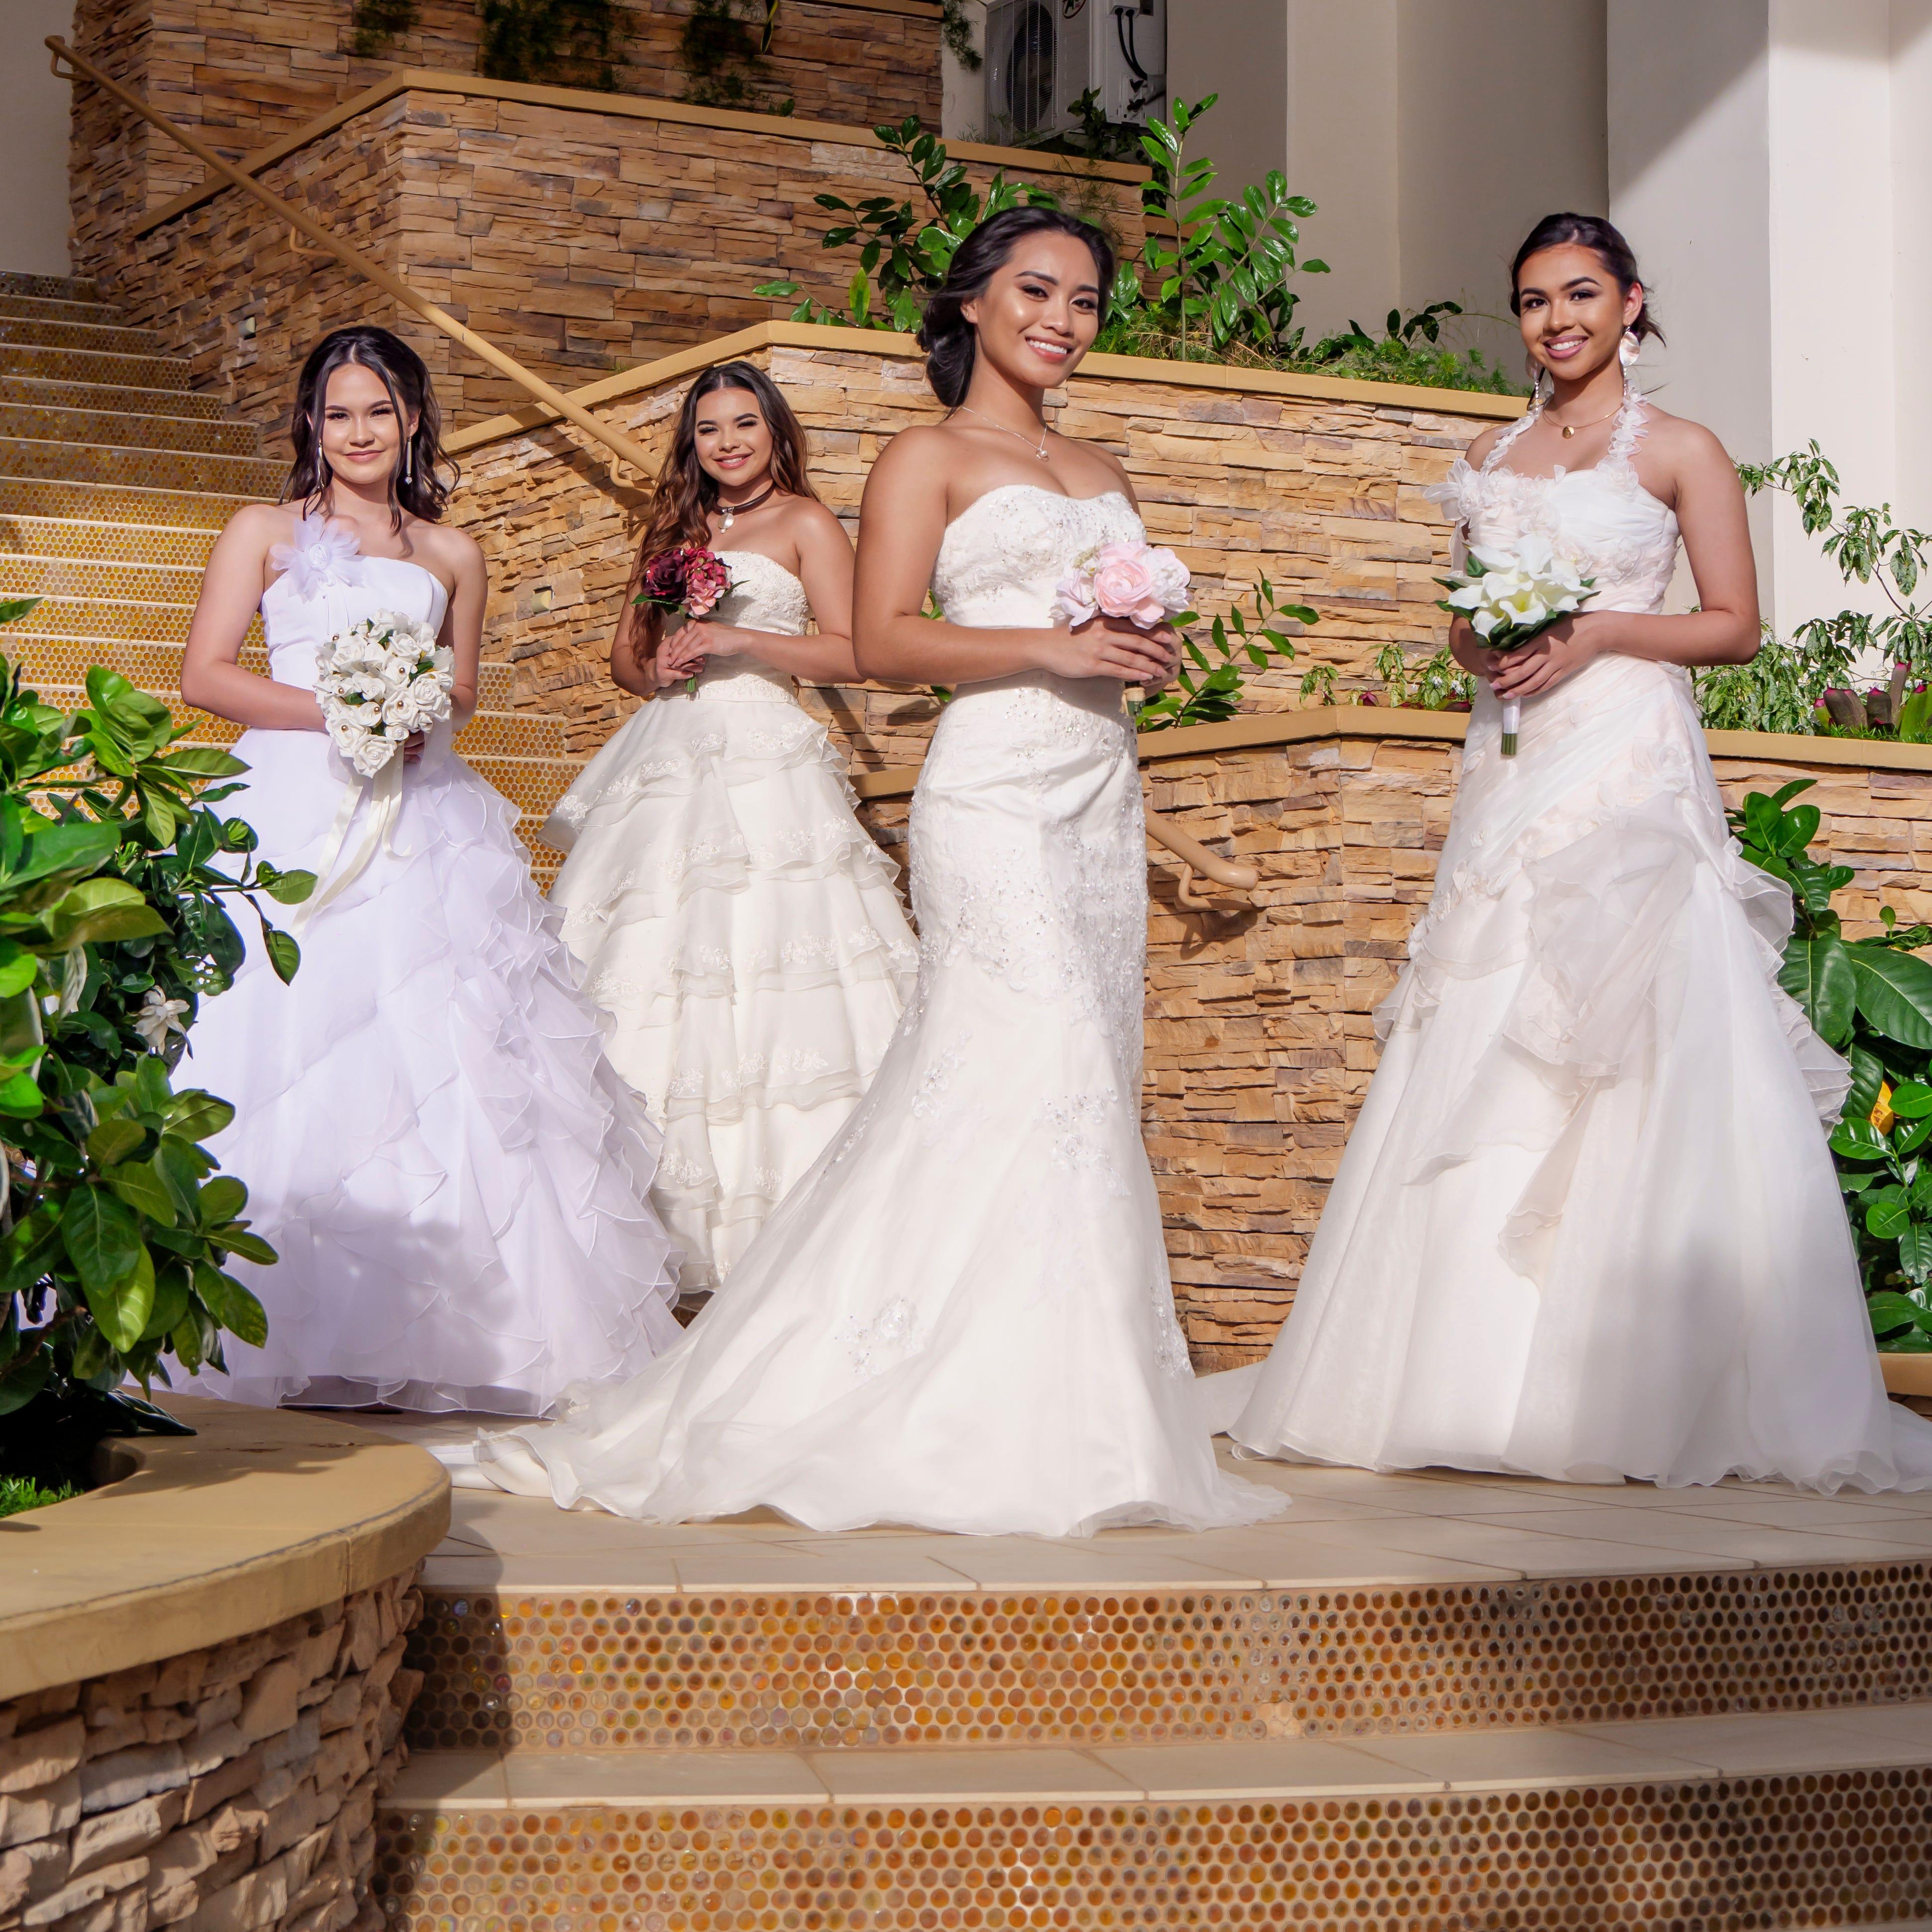 19th annual Weddings in Paradise Saturday at Hyatt